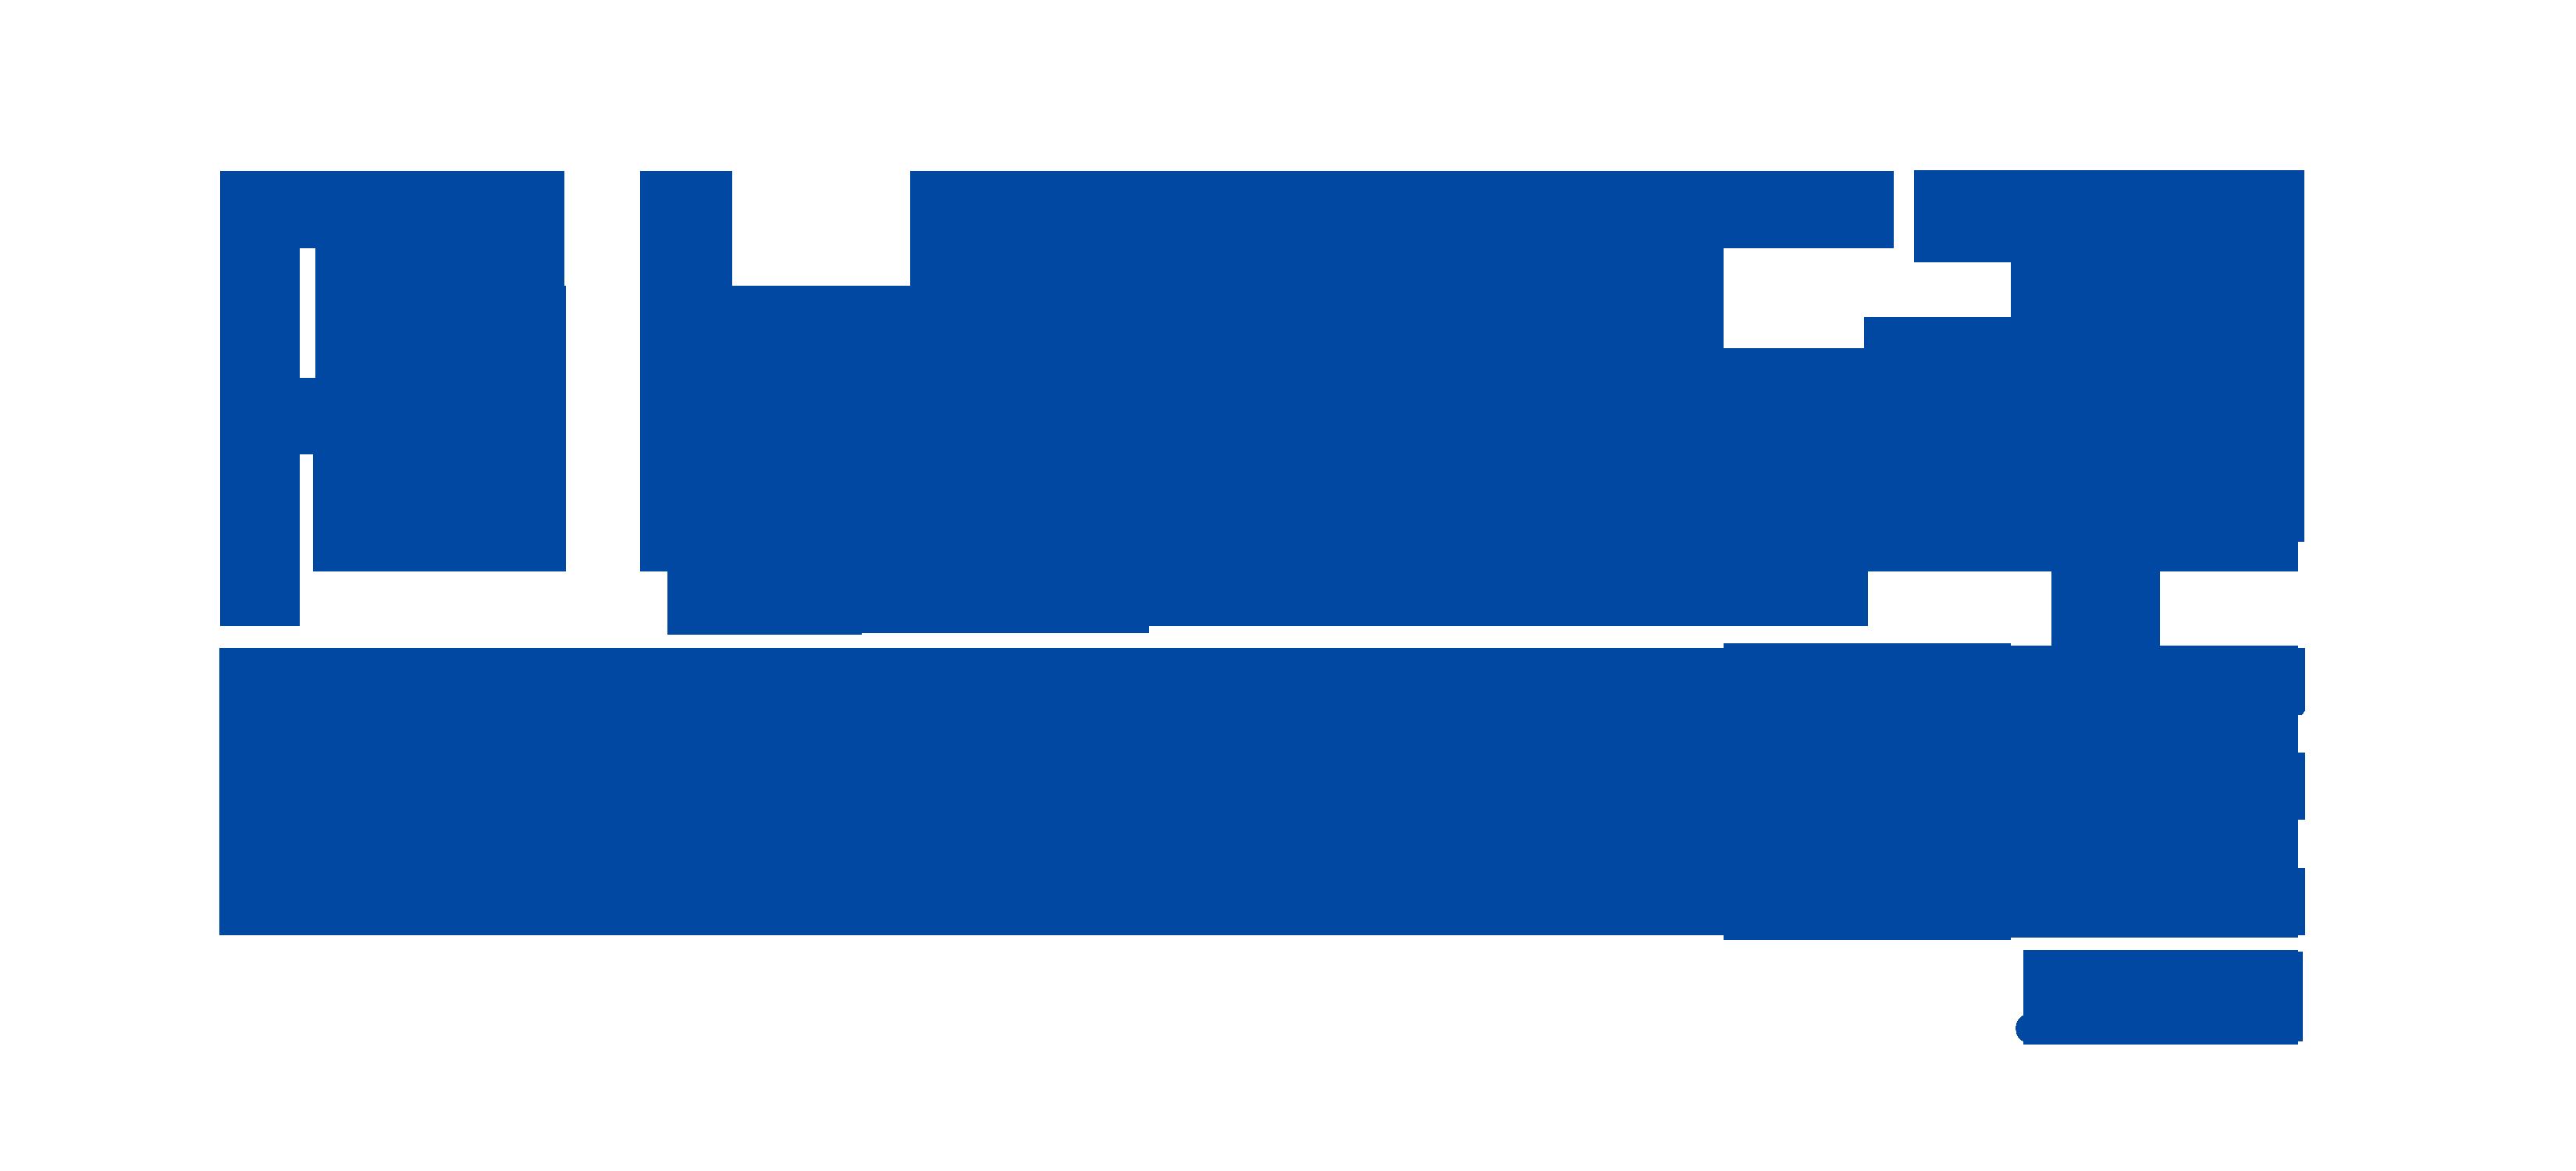 pure leverage email autoresponder